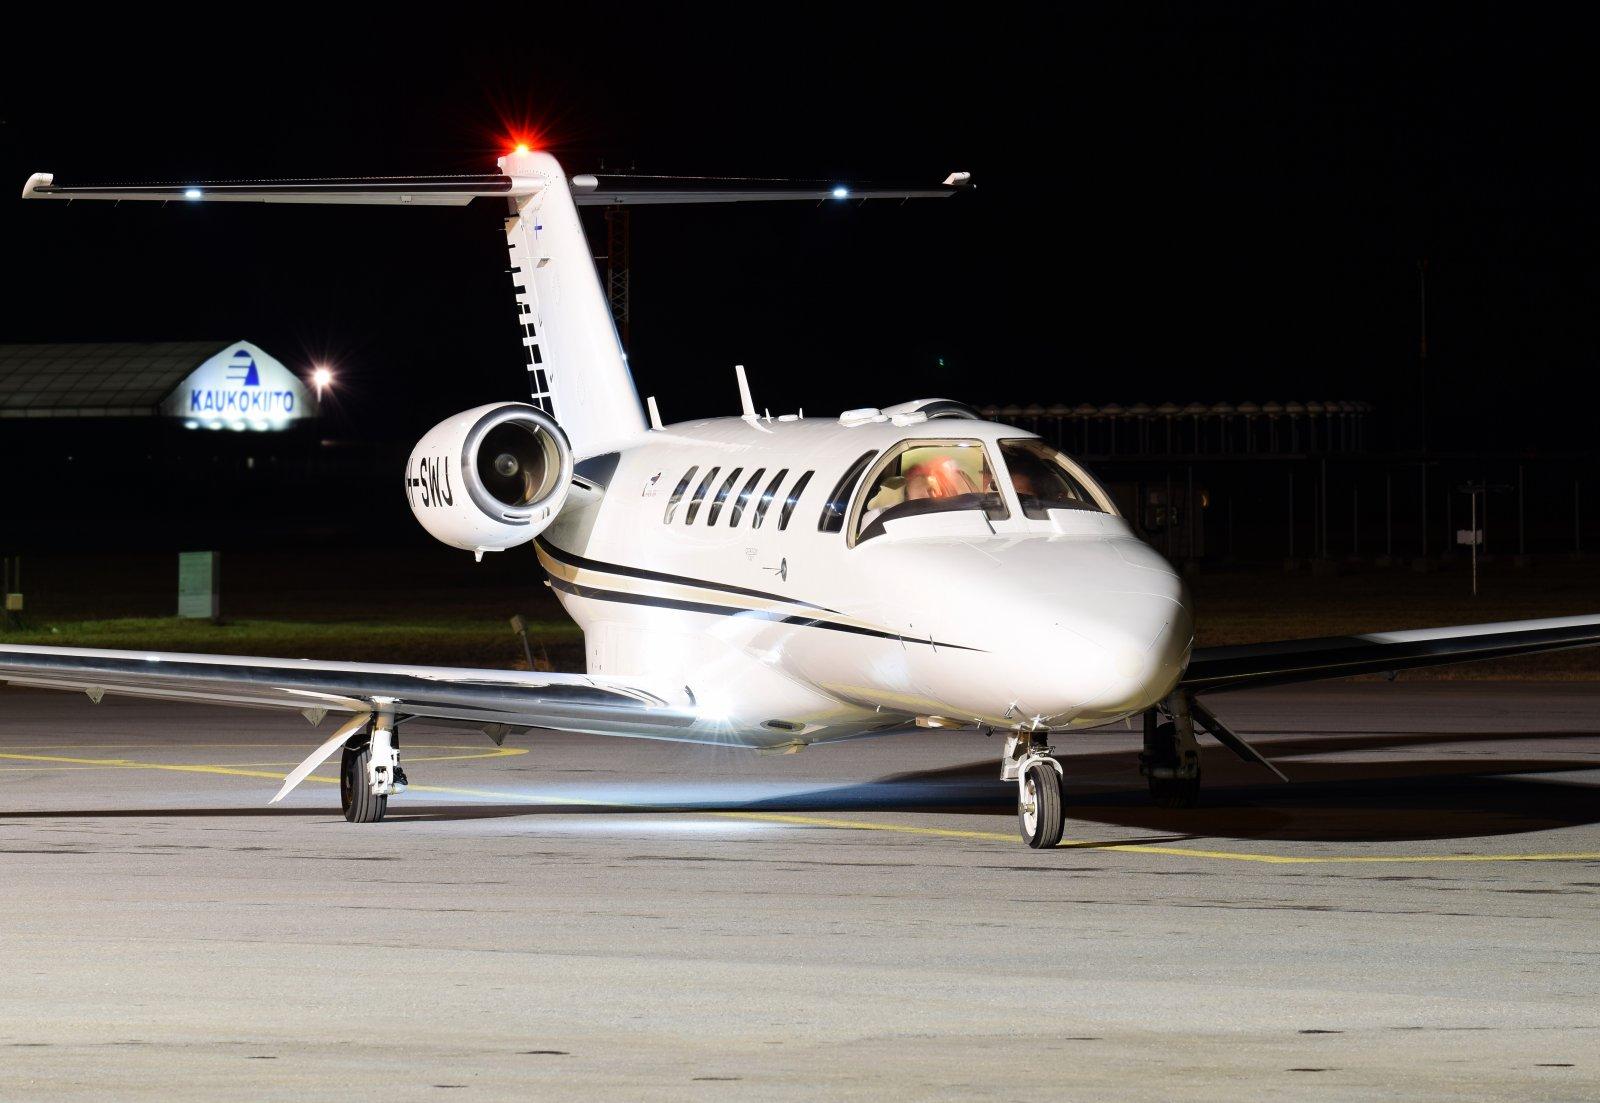 OH-SWJ - Cessna 525A CitationJet CJ2+ - Scanwings - 3.4.2019